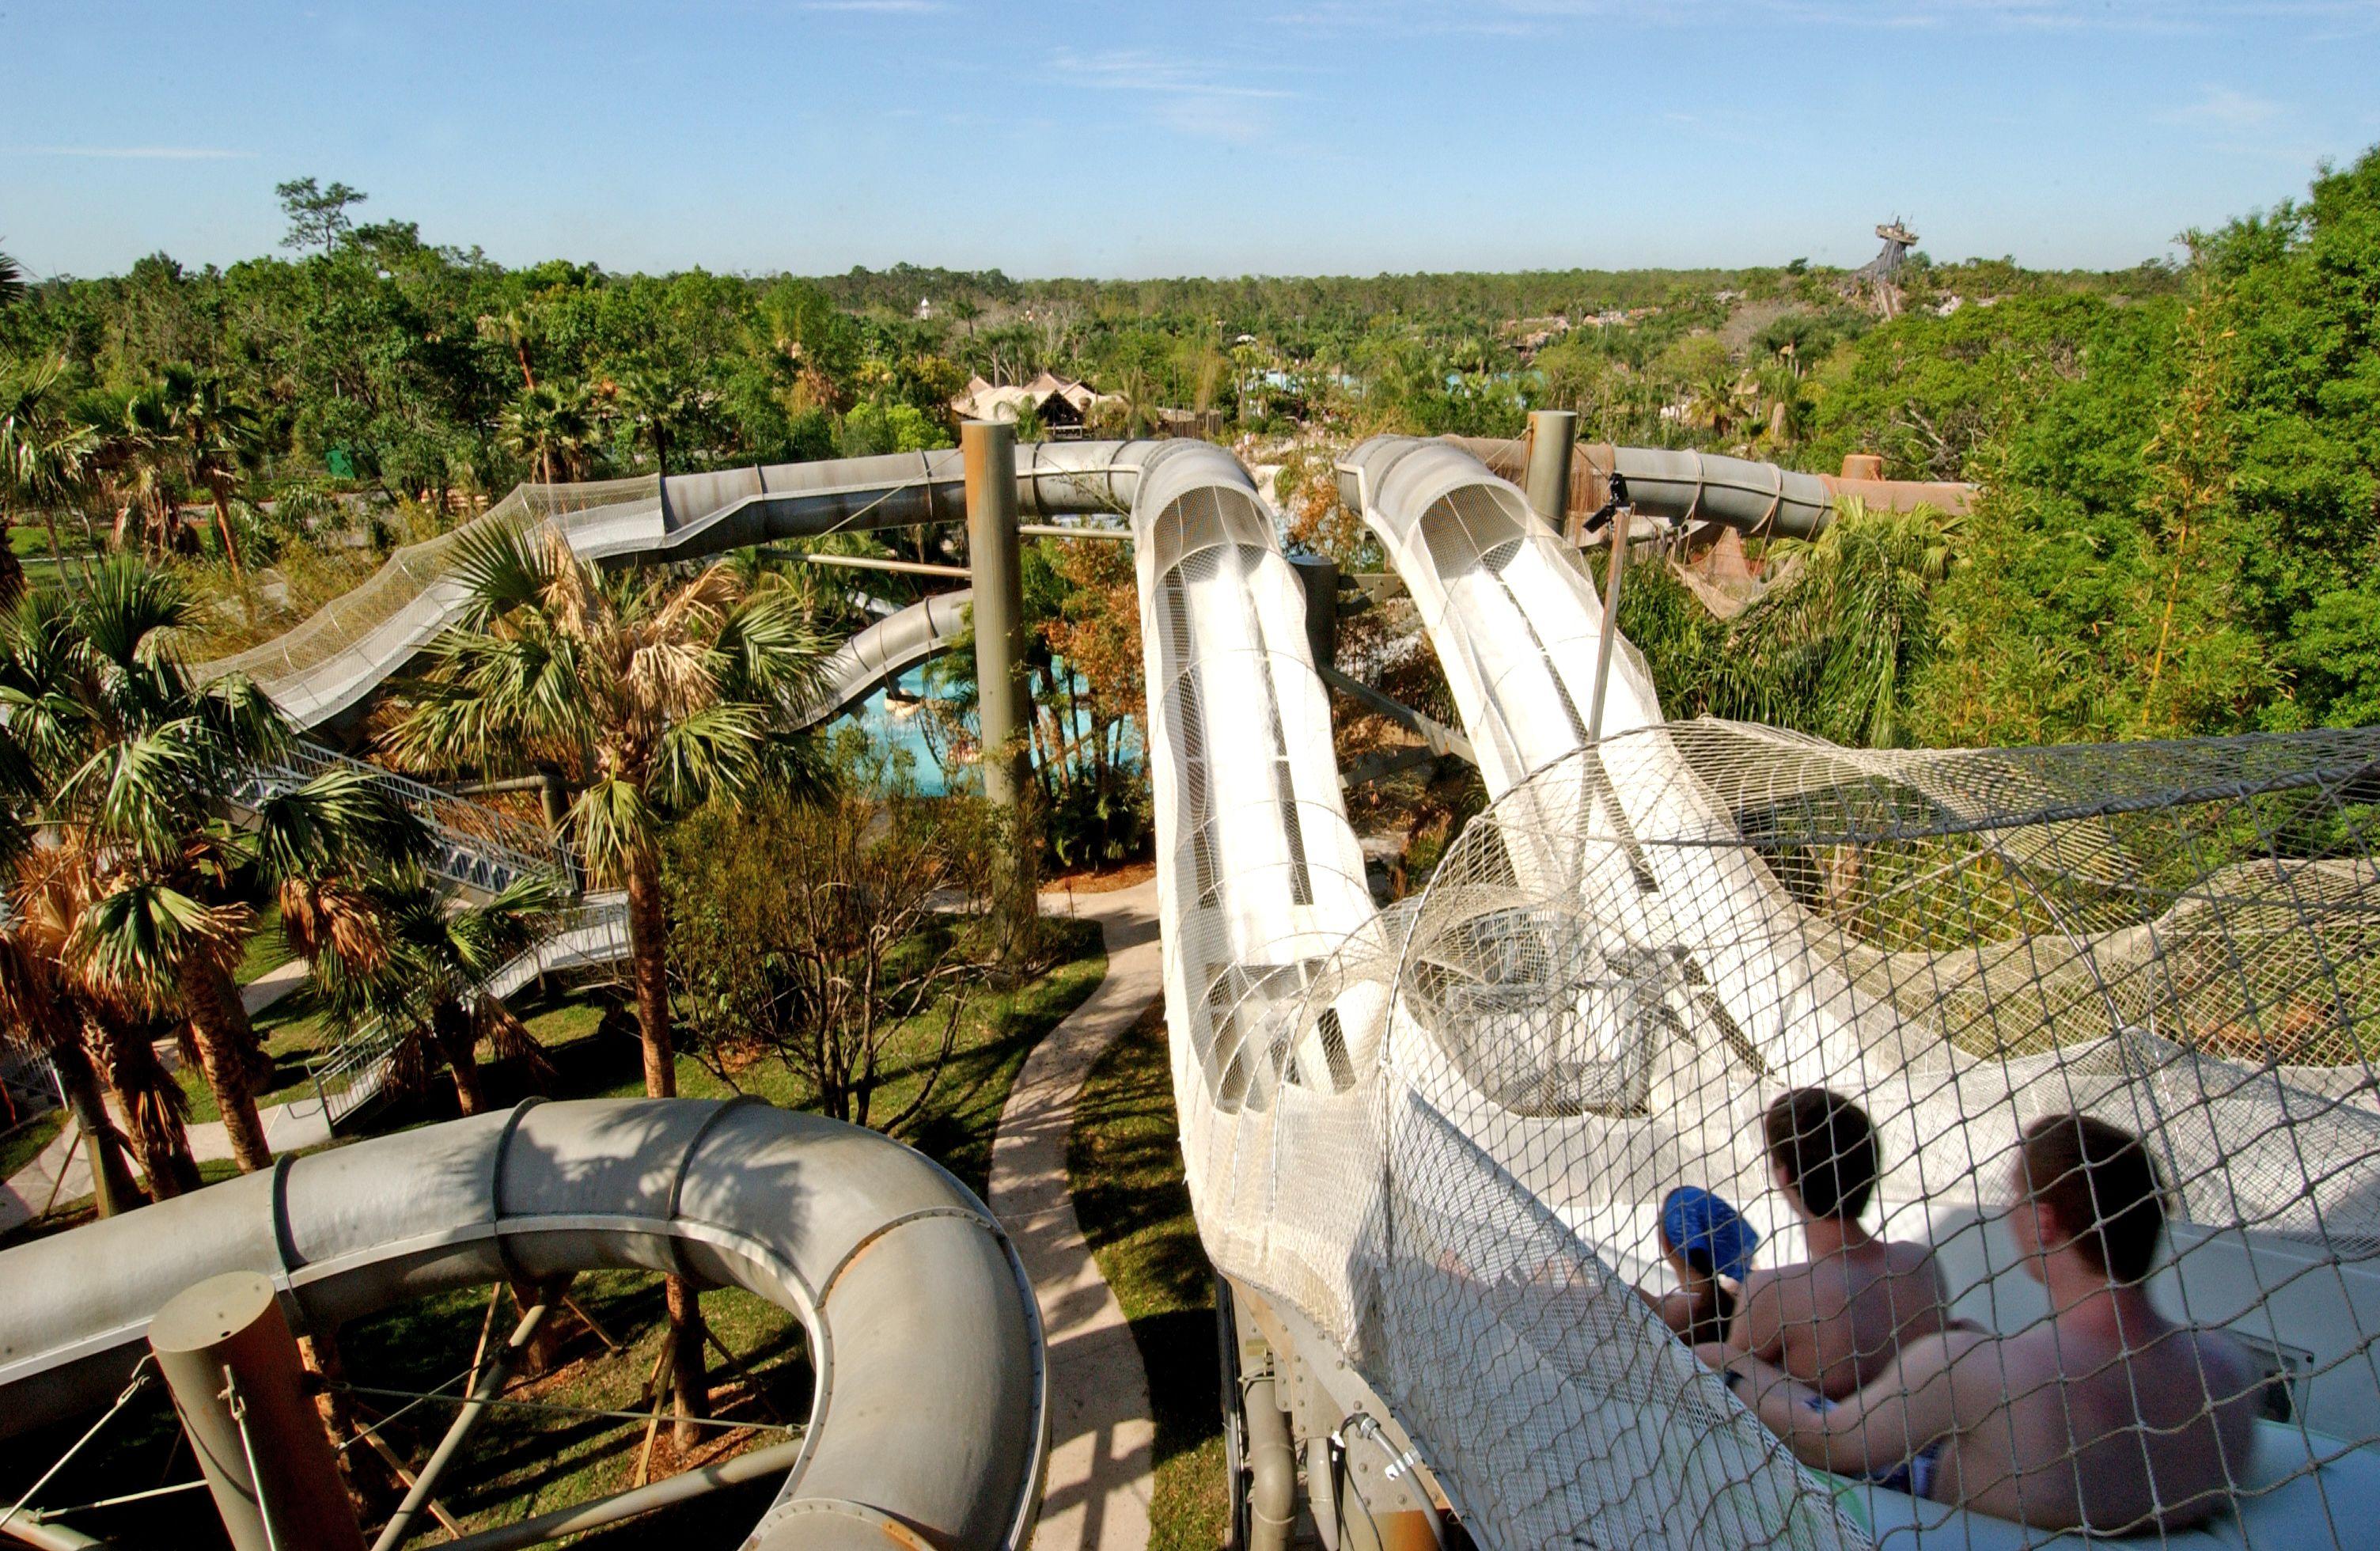 Crush 'n' Gusher Disney World water park ride